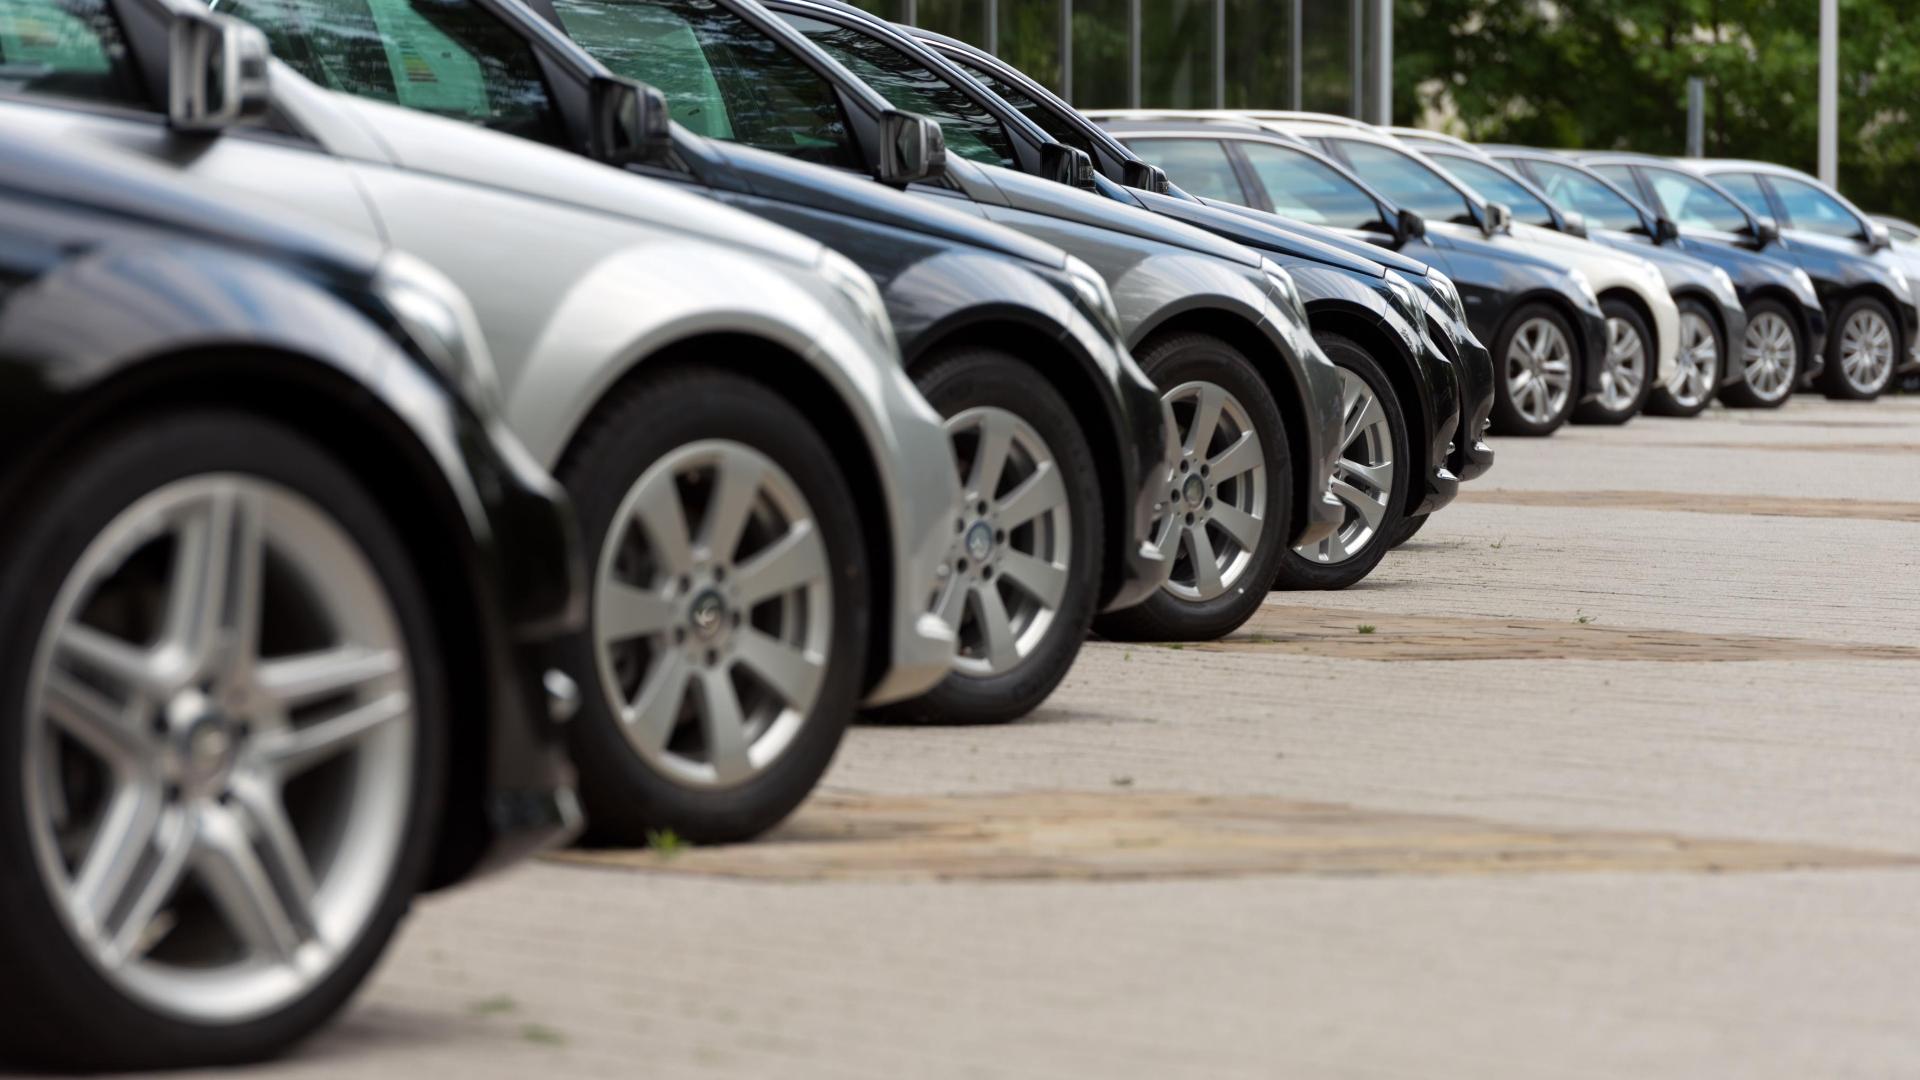 Second-hand car values down after 'market adjustment'.